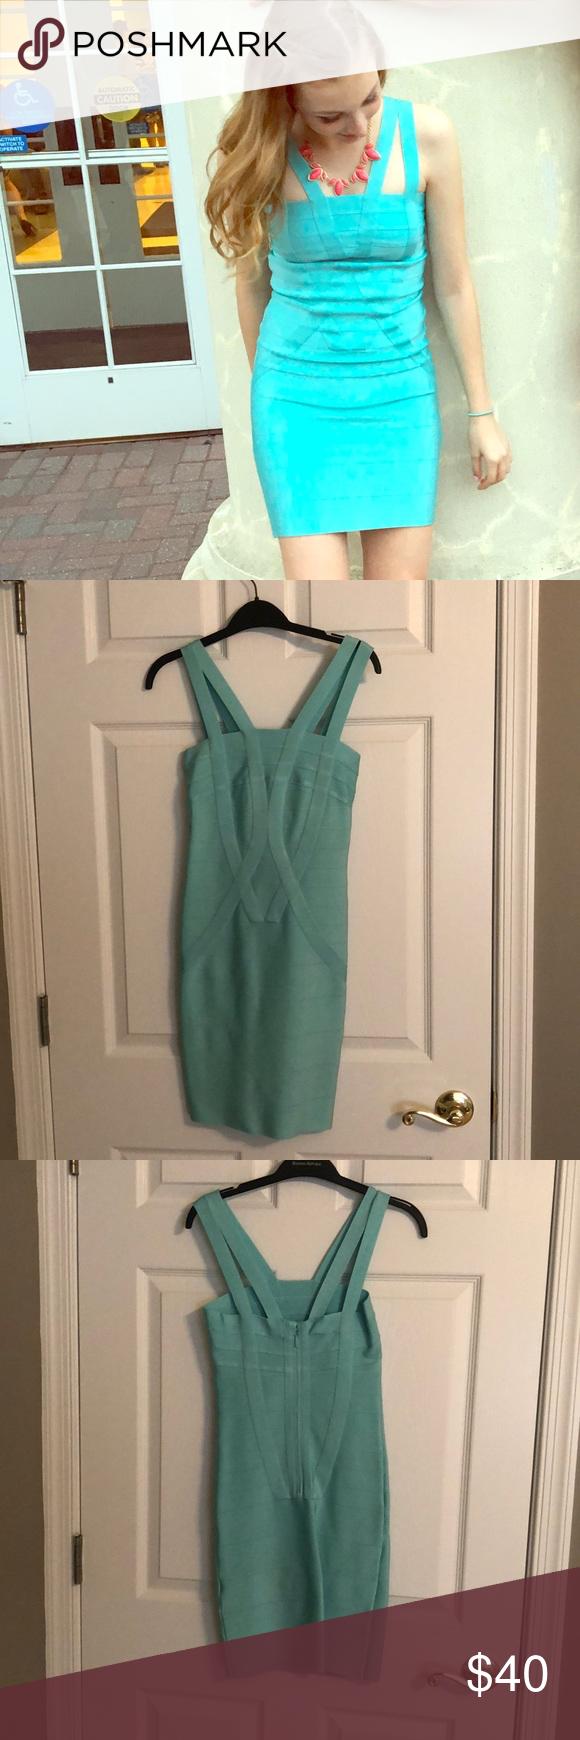 Bebe Turquoise Bodycon Dress Bebe Turquoise Bodycon Dress Worn Twice And Dry Cleaned 2b Bebe Dresses 2b Bebe Dress Bodycon Dress Clothes Design [ 1740 x 580 Pixel ]